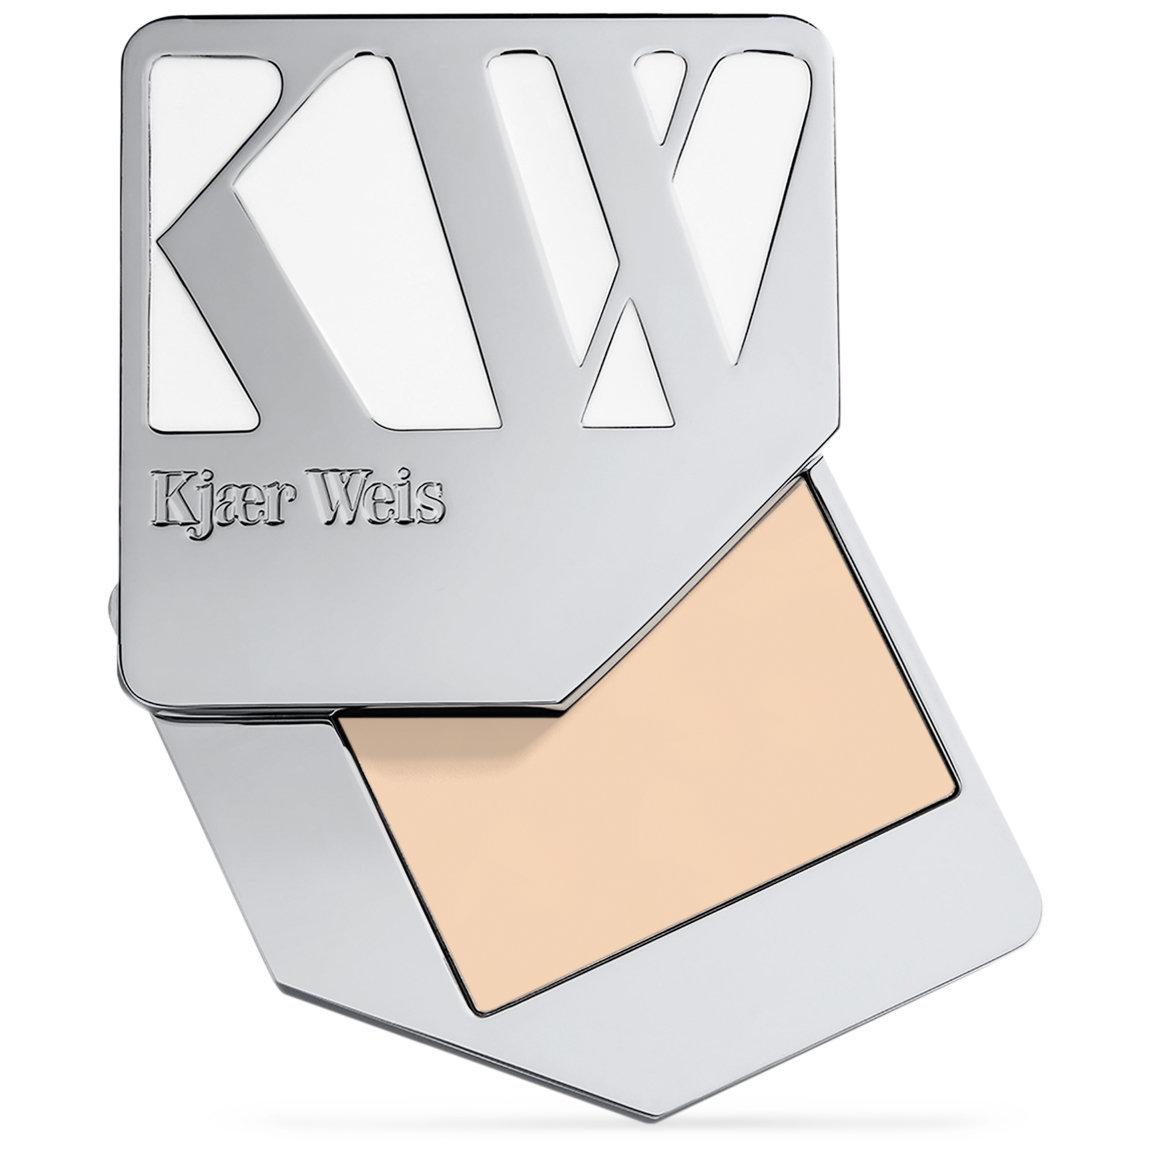 Kjaer Weis Cream Foundation Lightness alternative view 1.